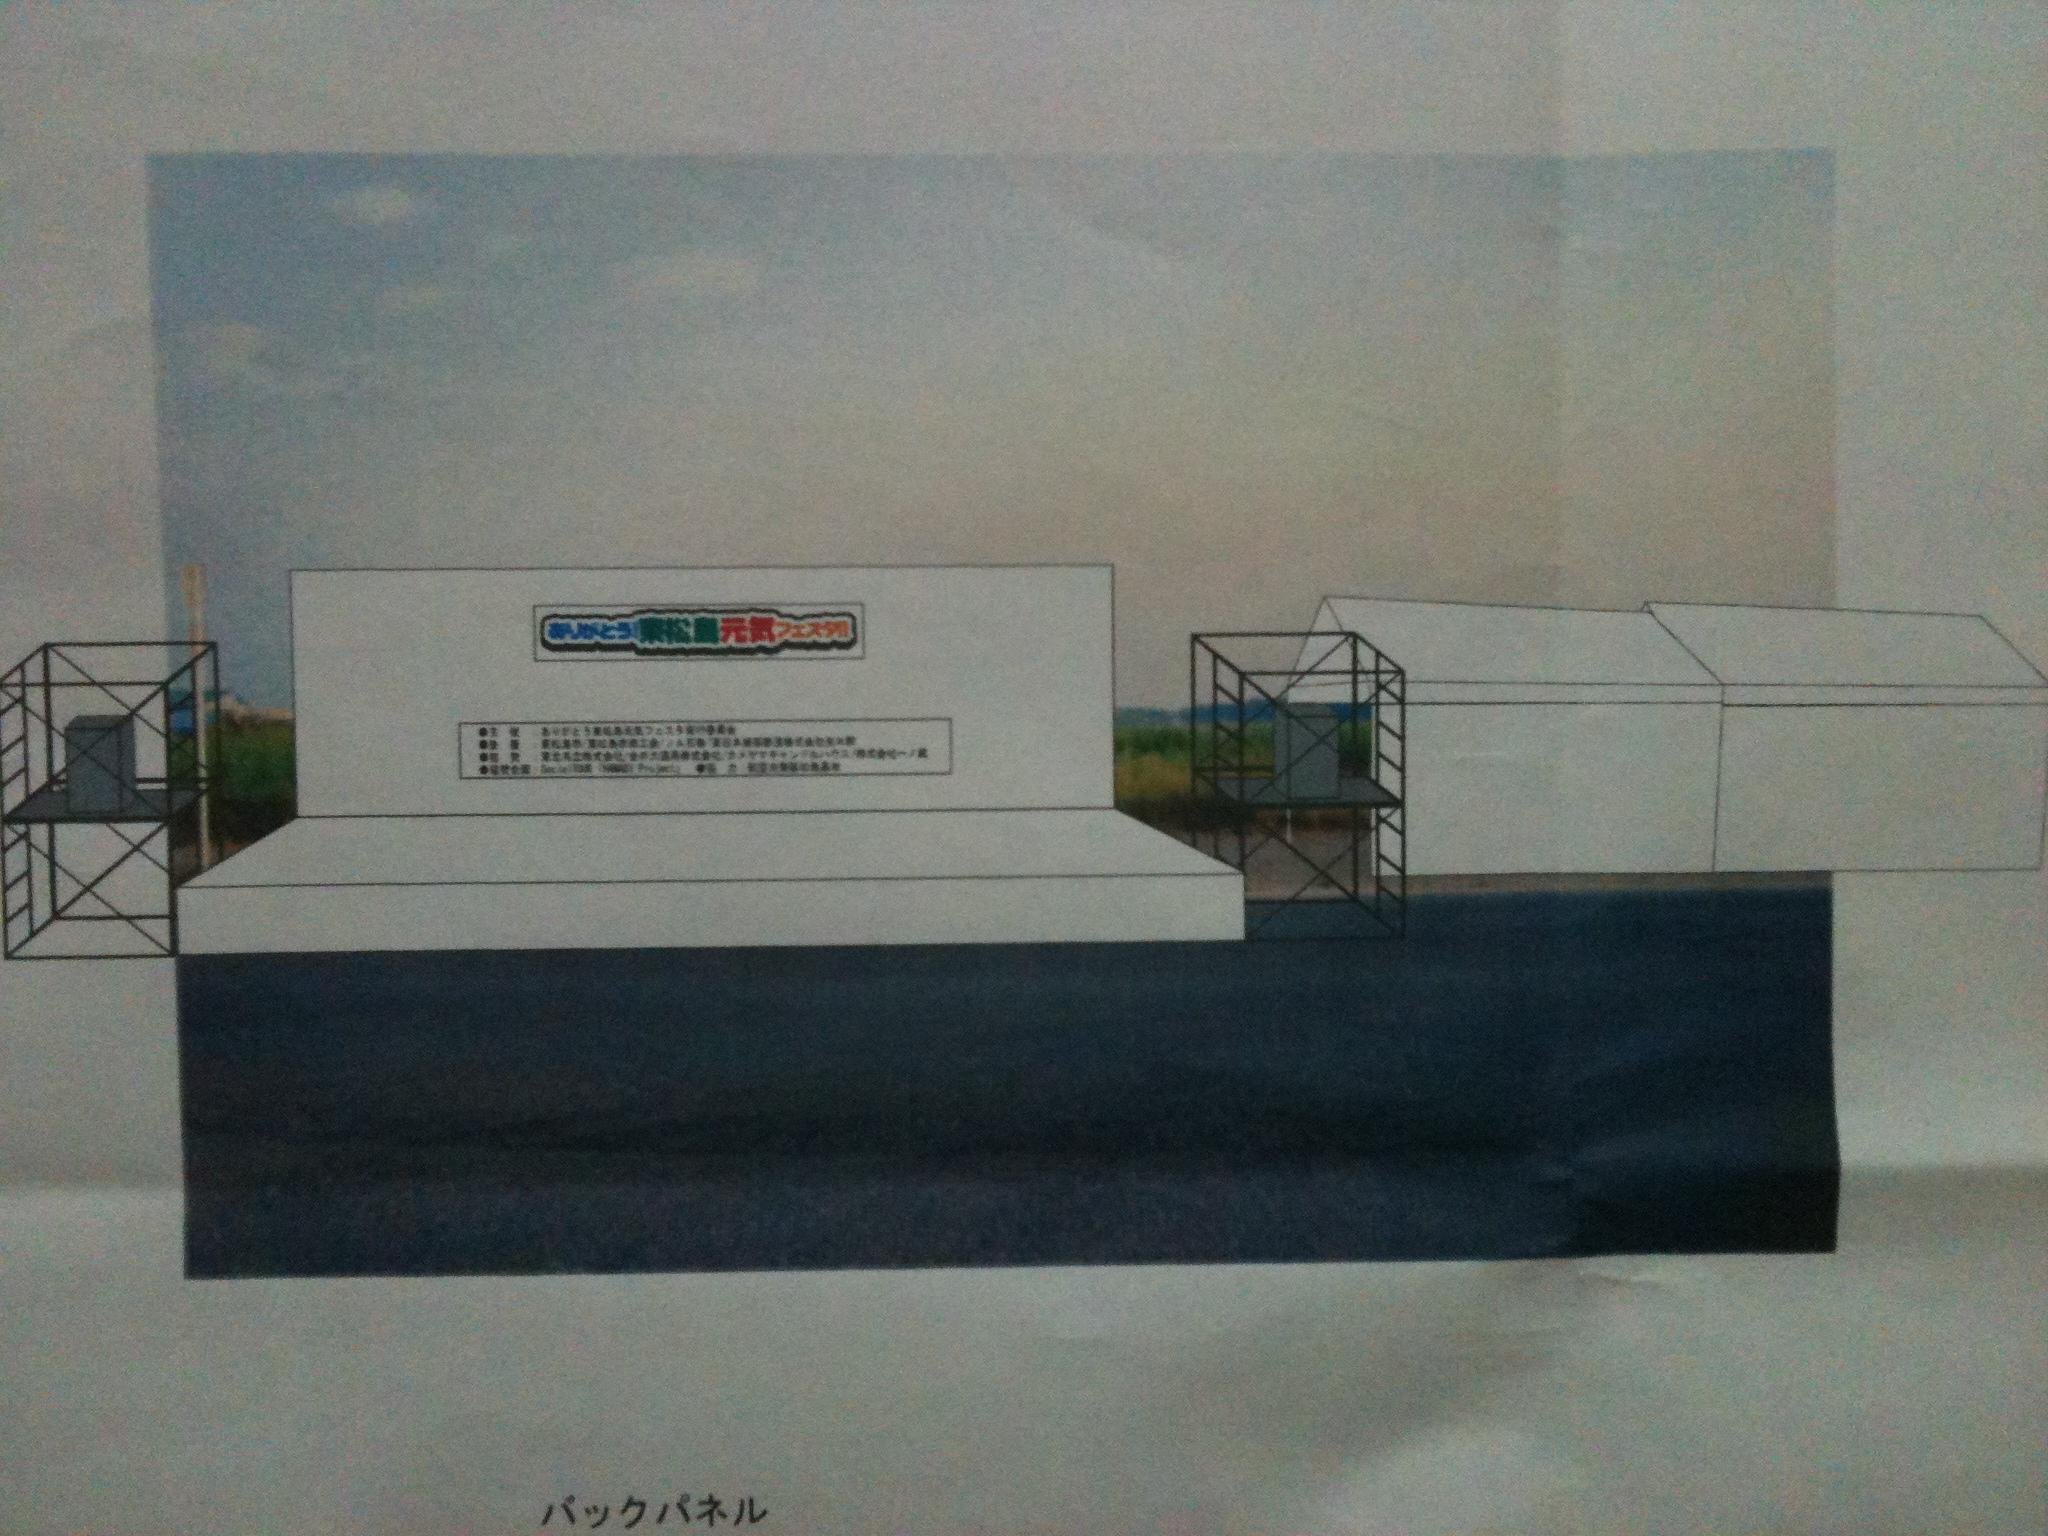 Aステージの新着情報のイメージ1